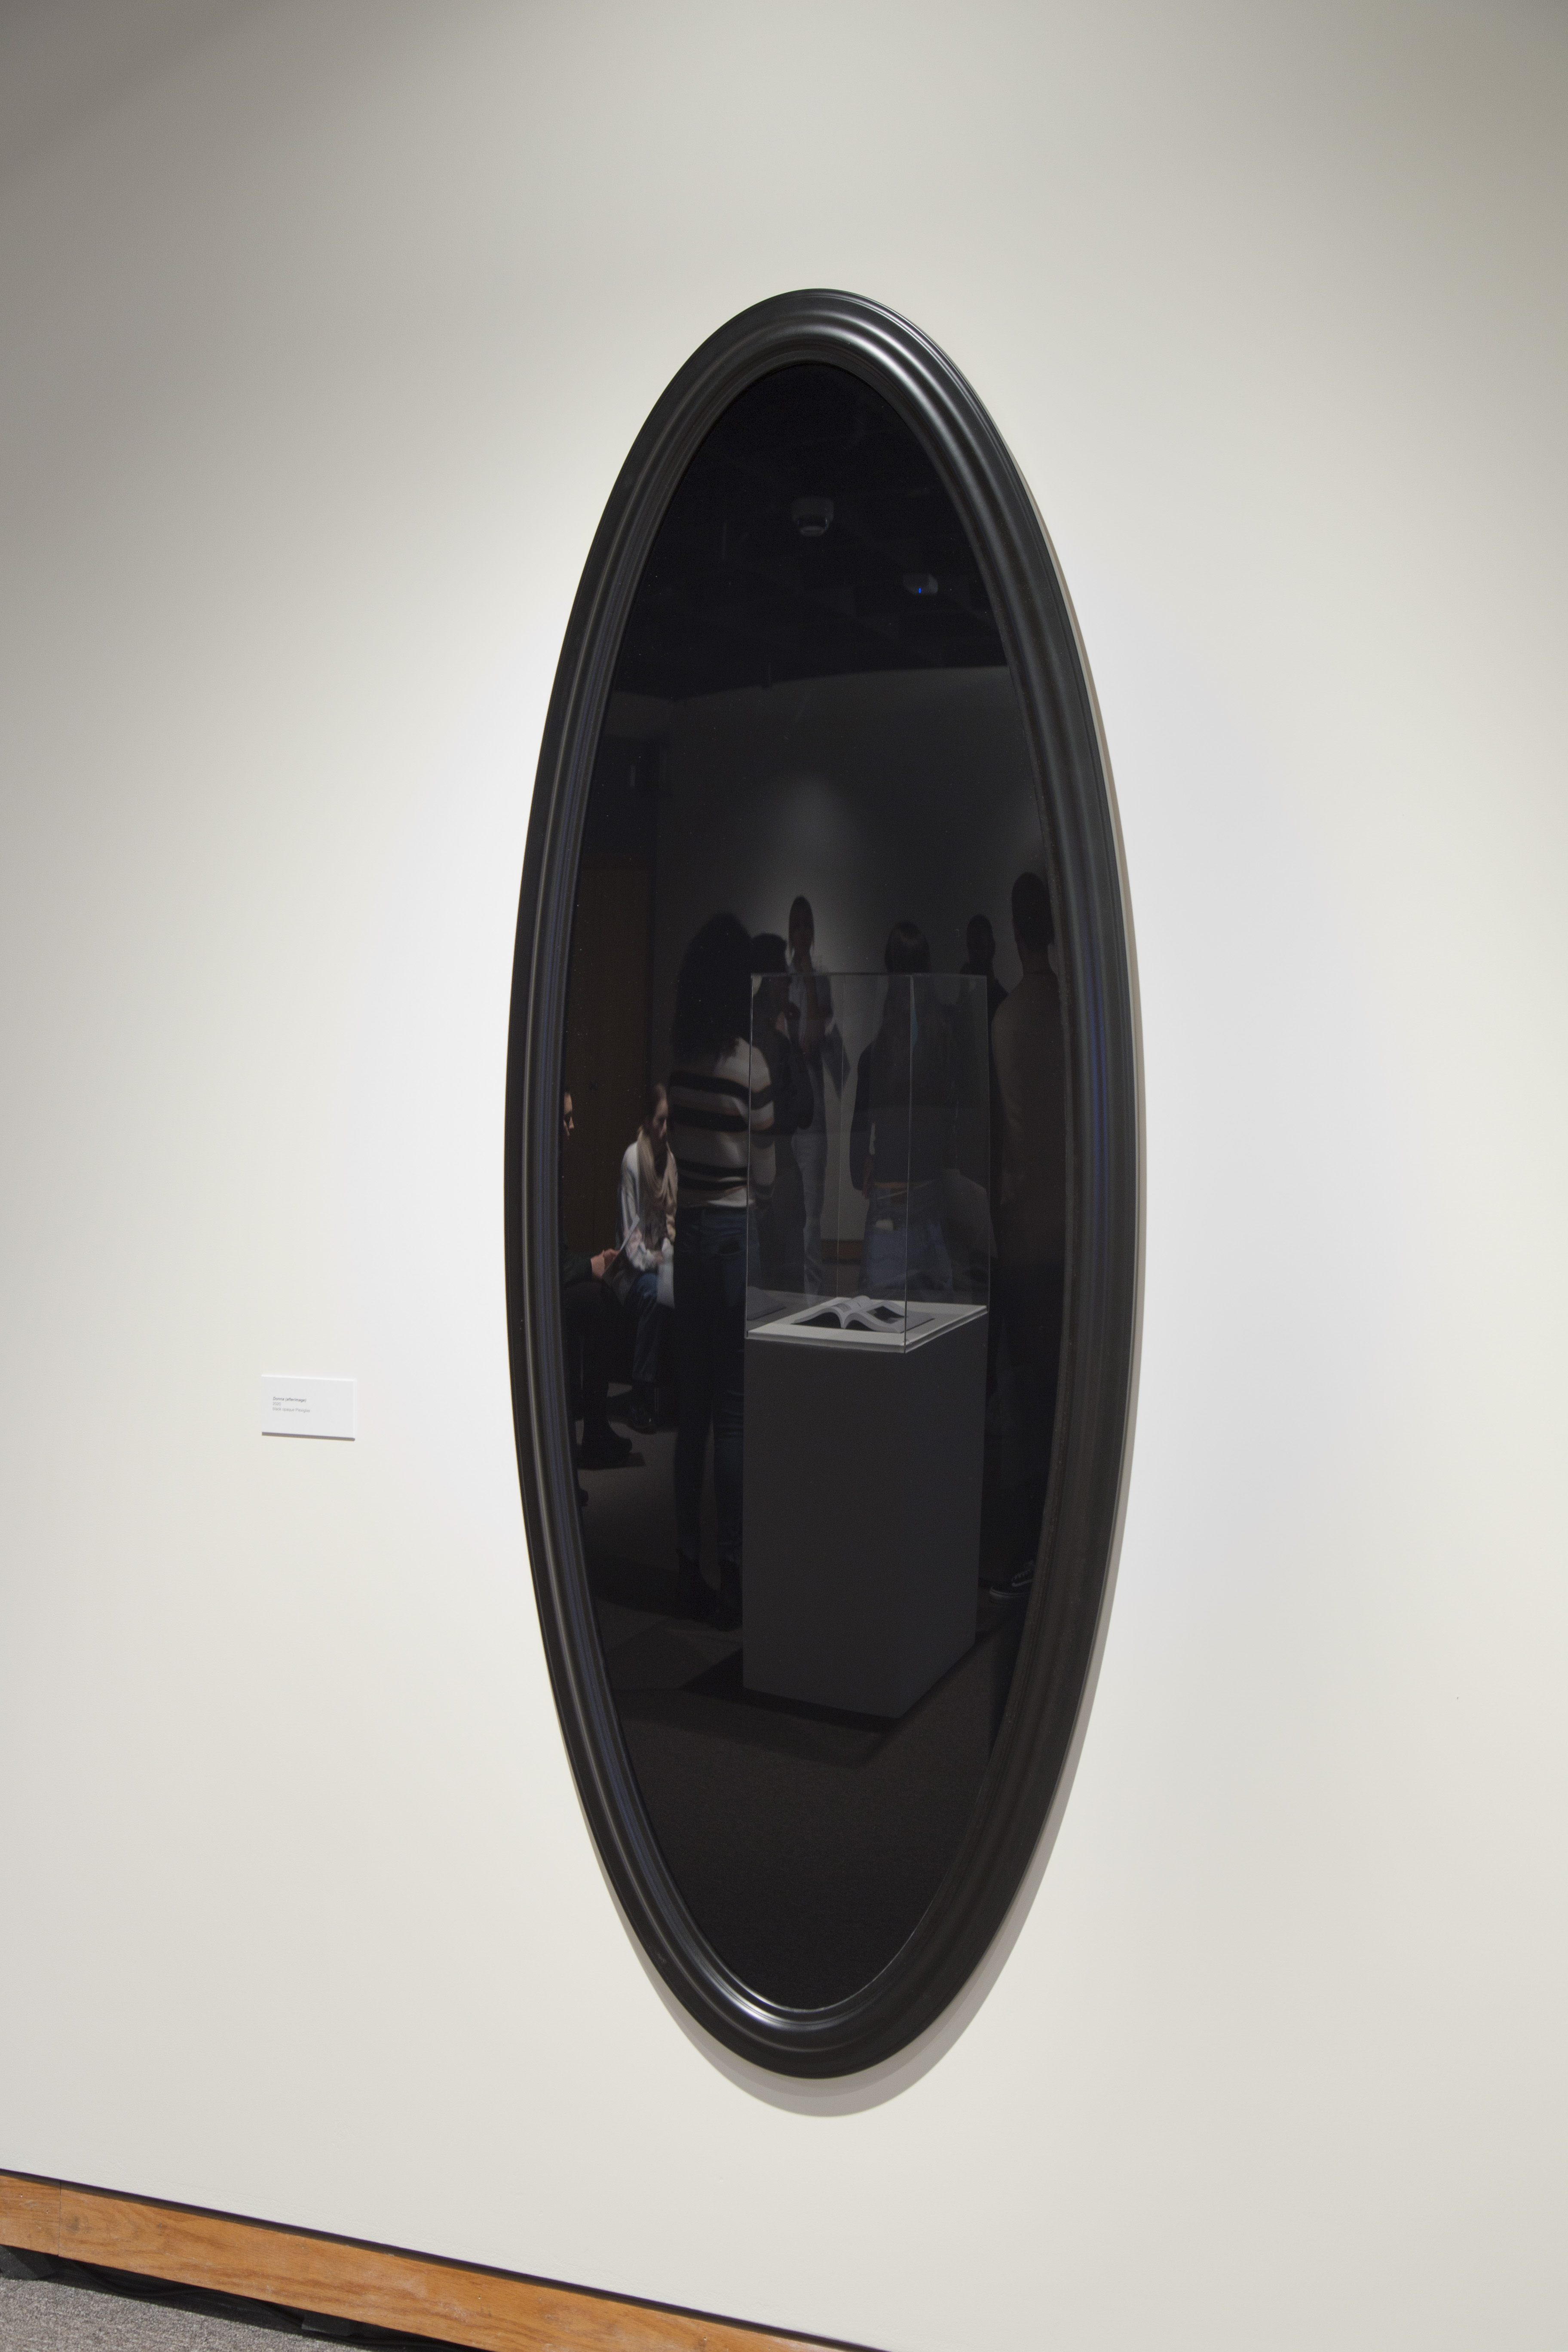 Black oval mirror by Deanna Bowen